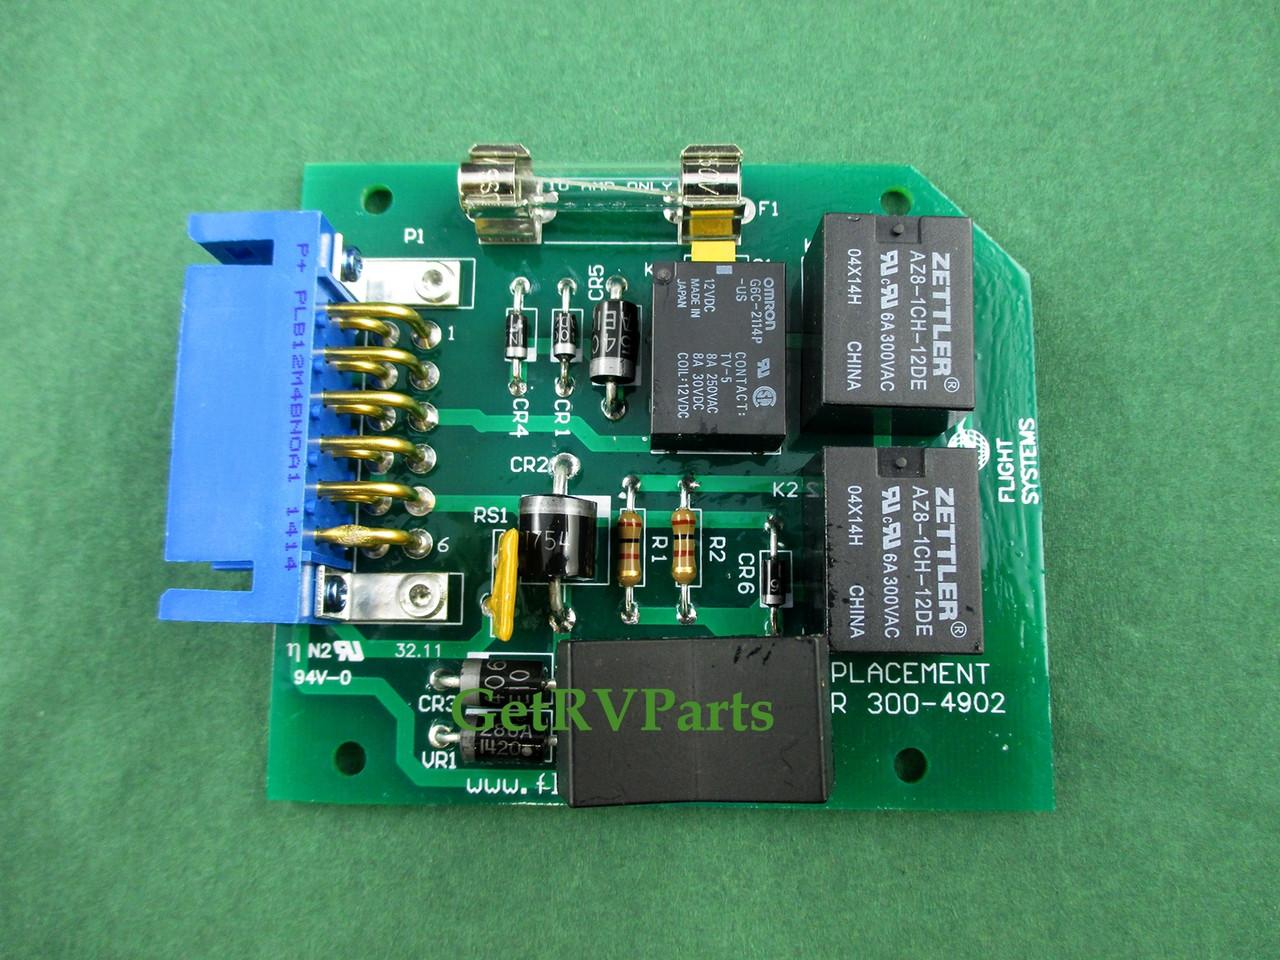 Onan Generator Wiring Diagram 300 3056 Board Start Building A Rv Remote Aftermarket 4902 Circuit Flight Systems Rh Getrvparts Com Switch